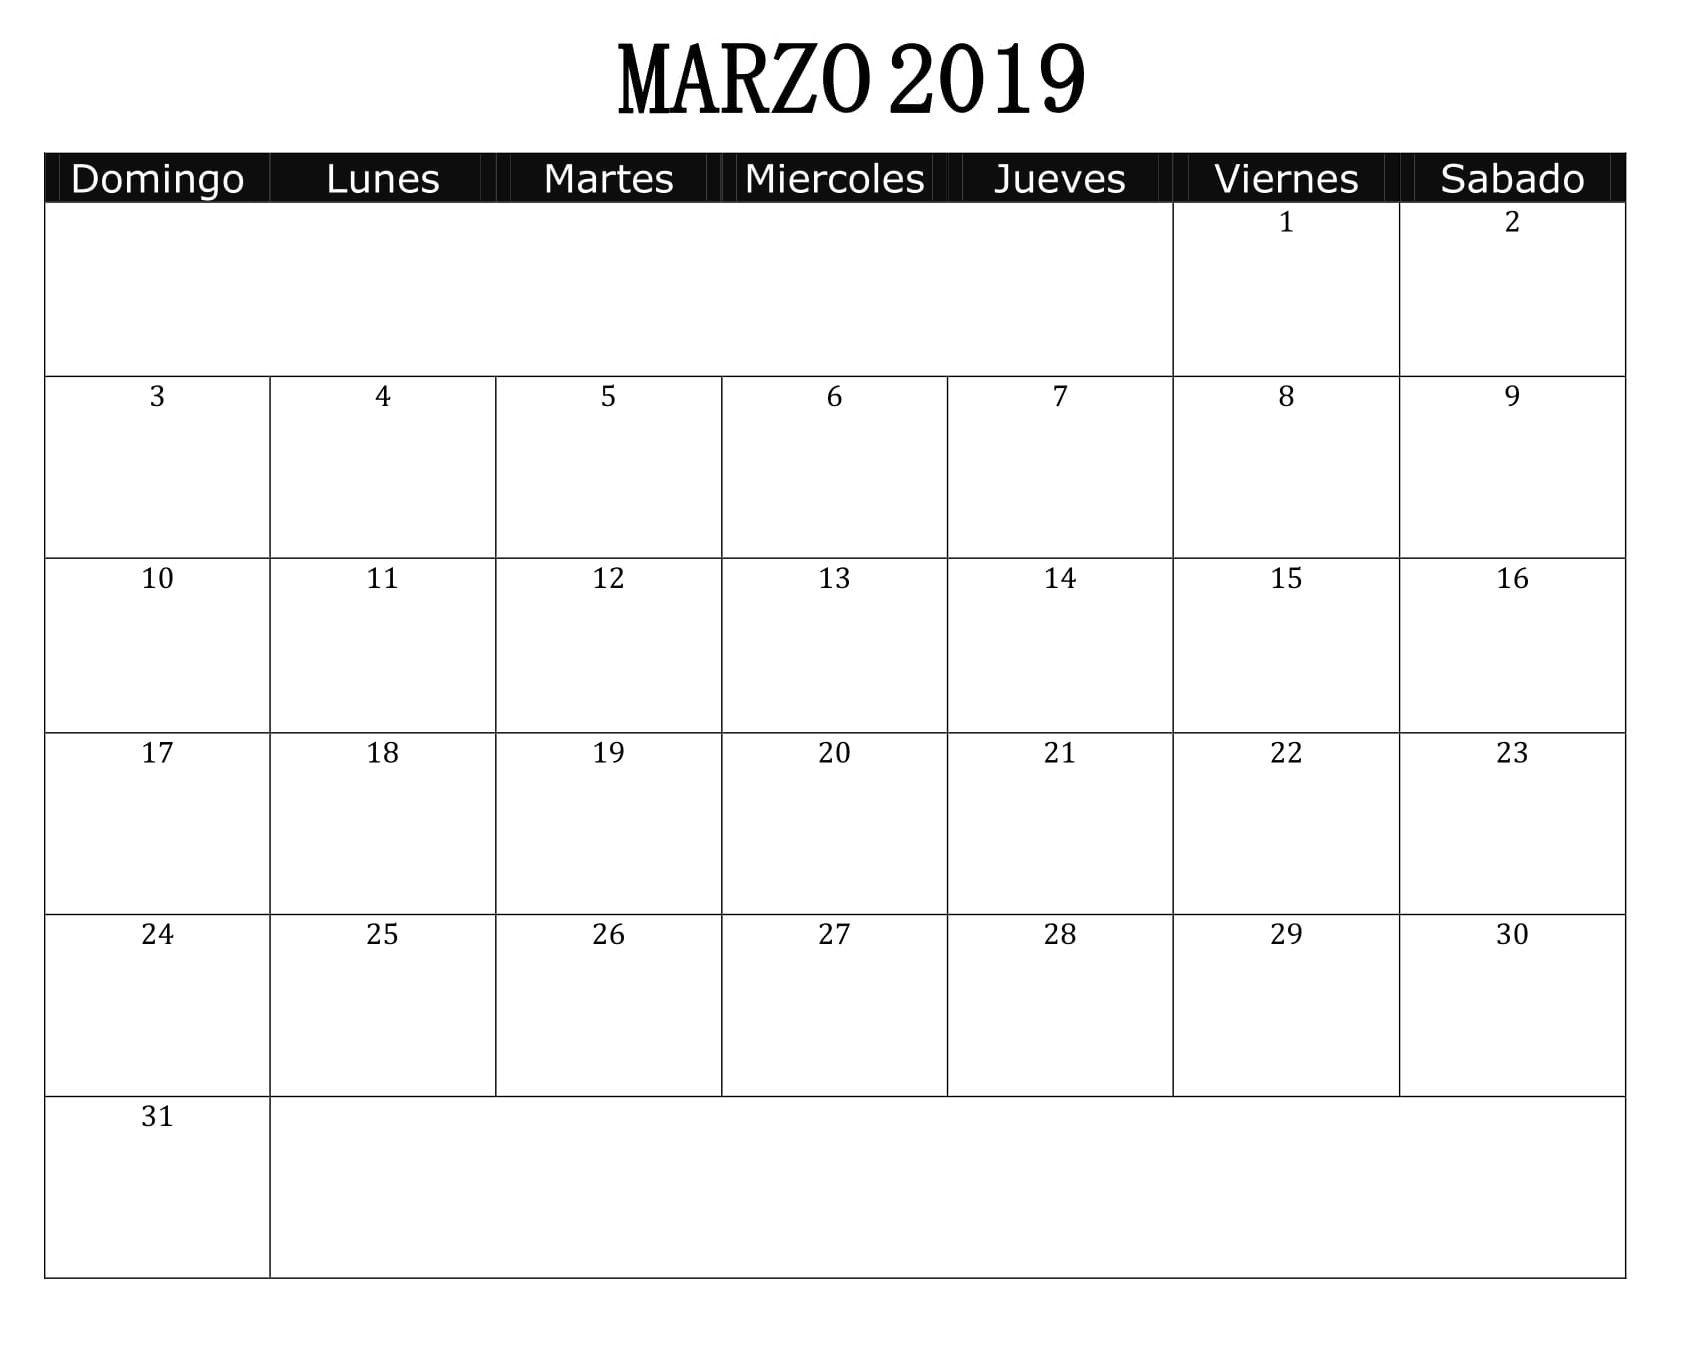 Calendario De Vacaciones 2019 Mexico Actual Calendario Marzo 2019 Para Imprimir Calendar Of Calendario De Vacaciones 2019 Mexico Mejores Y Más Novedosos Calendario Octubre 2018 Colombia T